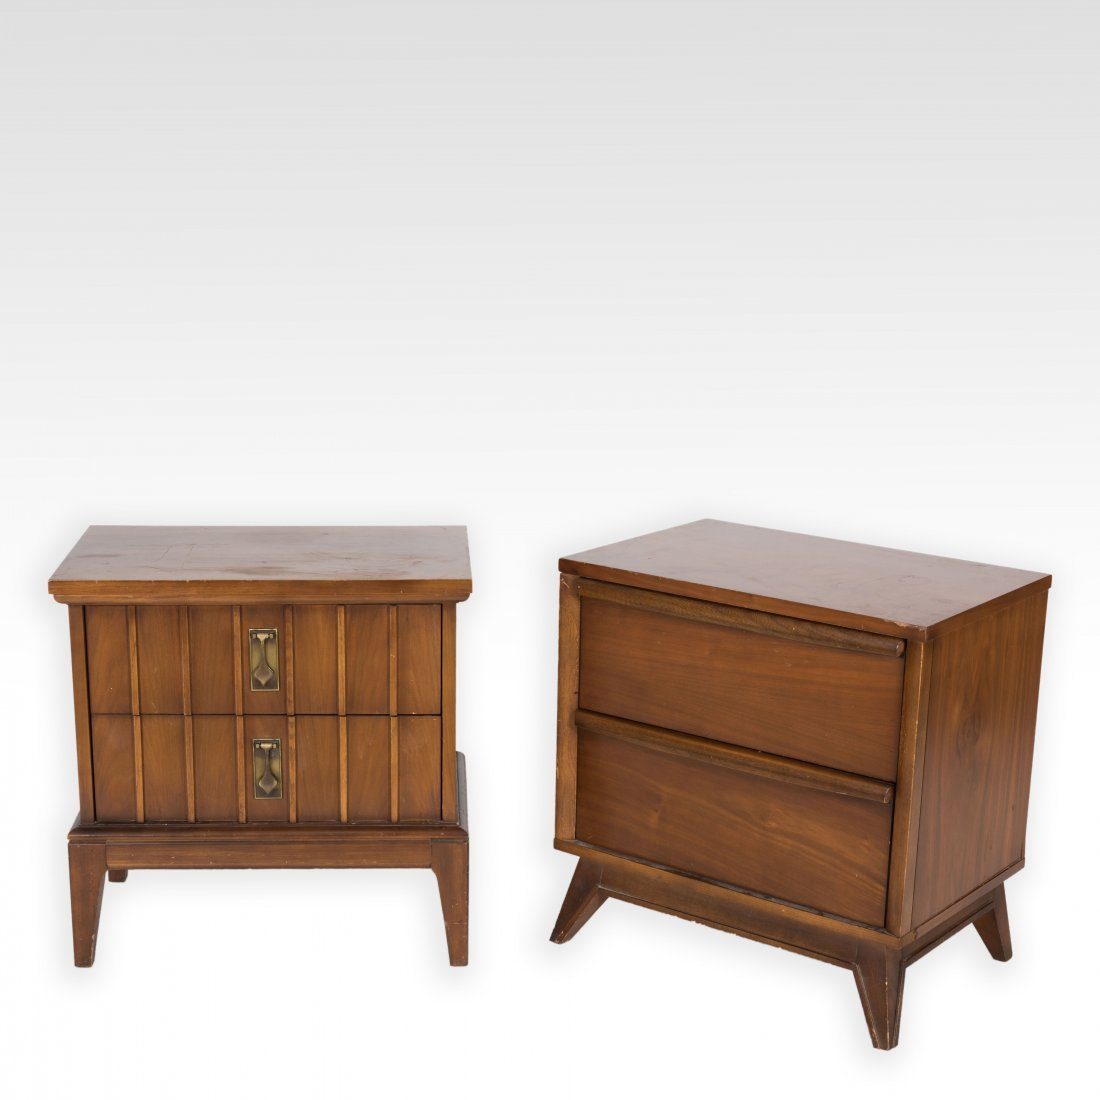 Two Mid Century Walnut Nightstands - Unagusta